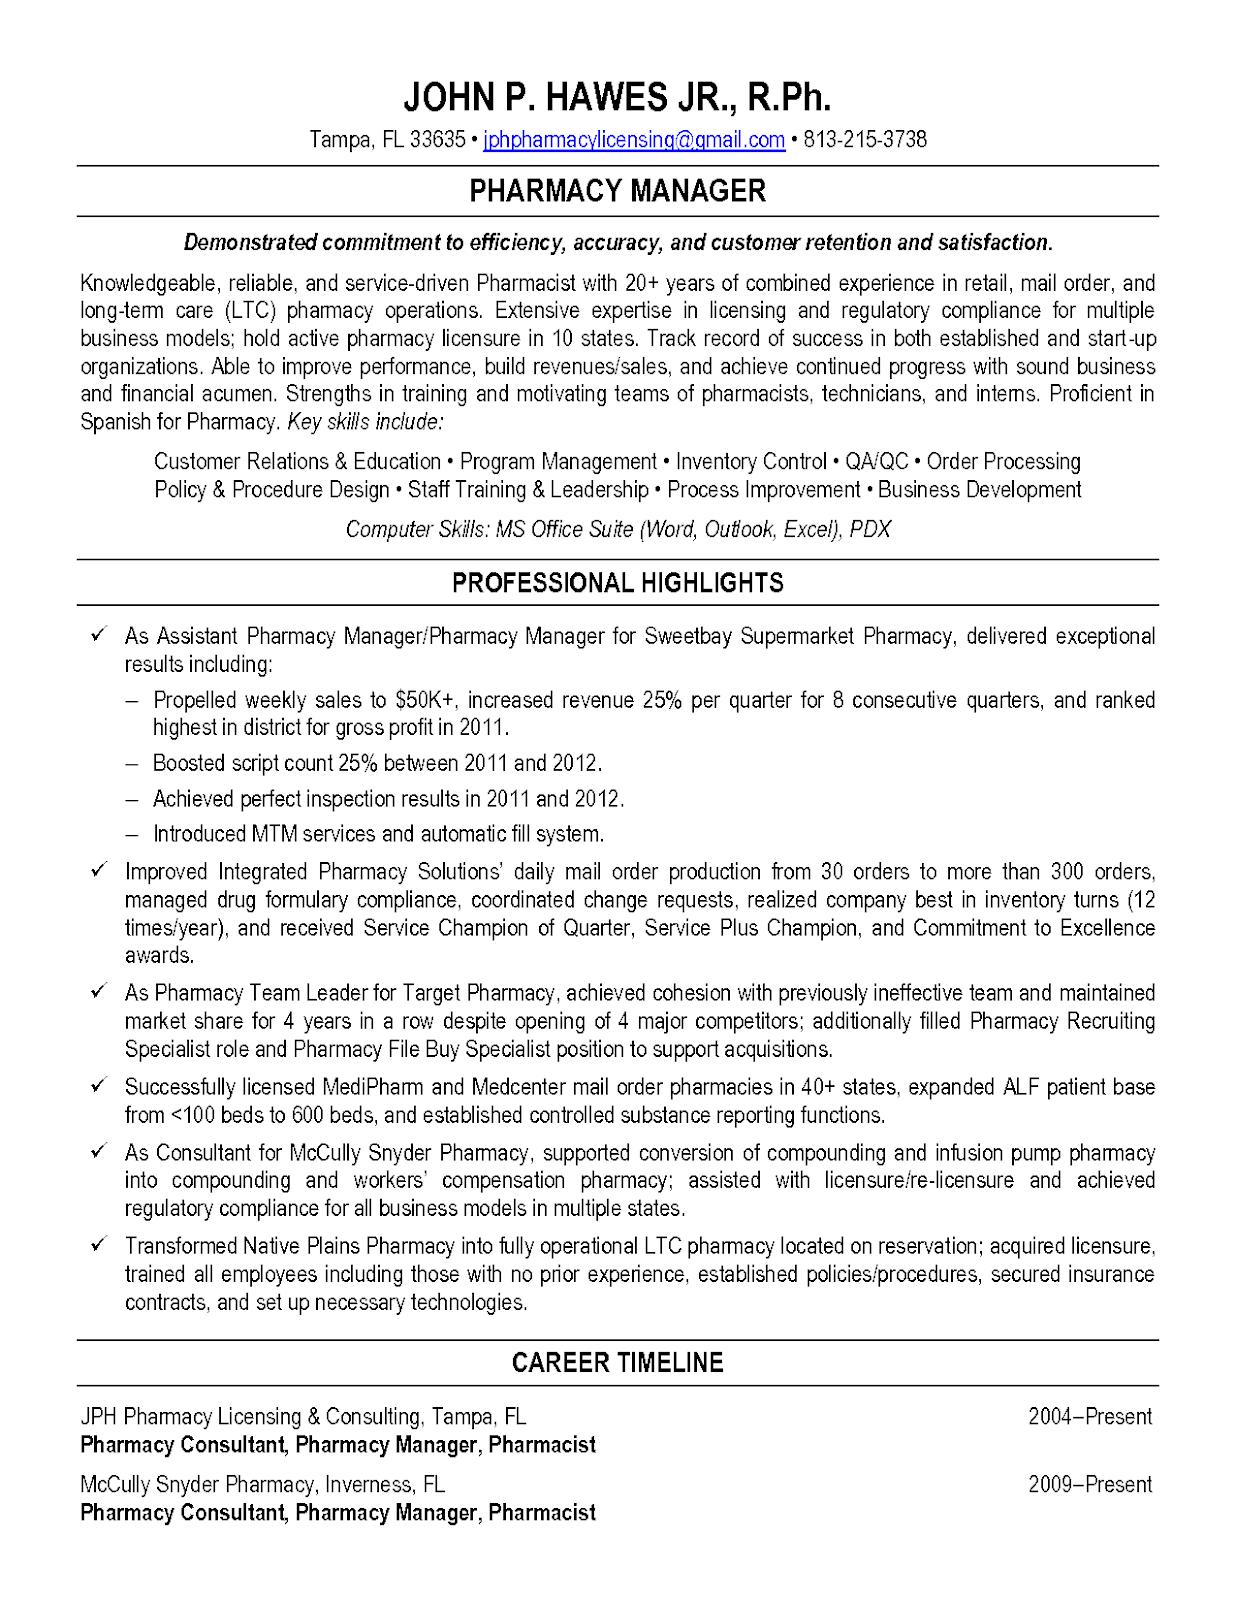 Pharmacist Resume Examples 2019, pharmacist resume example, pharmacist resume sample australia, pharmacist cv example pdf, pharmacist cv example, pharmacist cv examples, pharmacist curriculum vitae examples, pharmacist cv examples uk, pharmacist cv examples and templates, retail pharmacist resume examples, clinical pharmacist resume examples, pharmacist objective resume example, hospital pharmacist resume example,